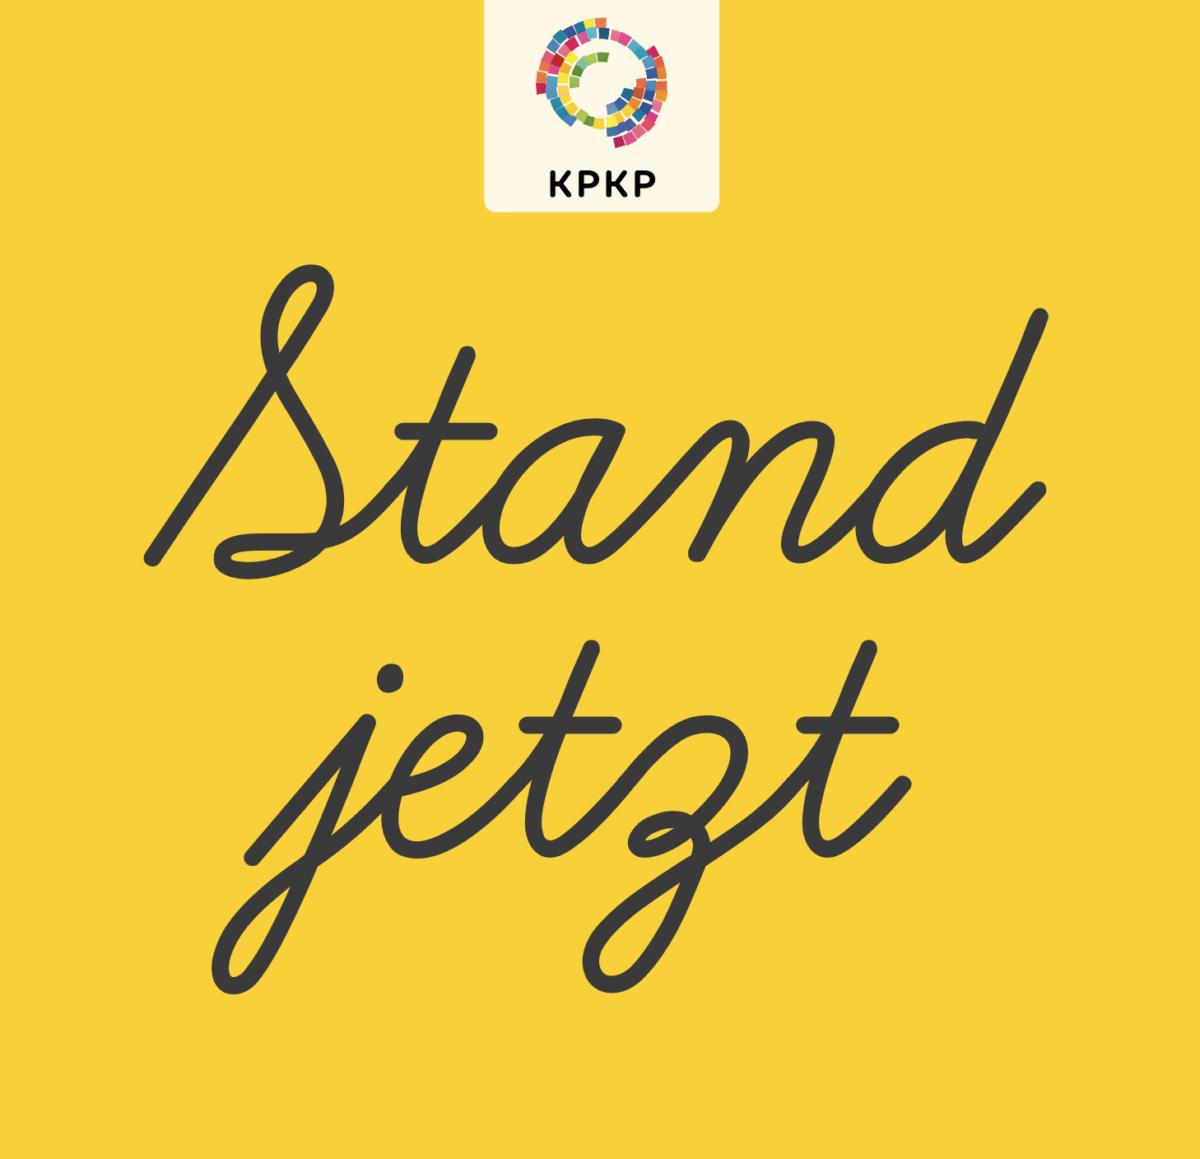 KPKP027 Stand jetzt - LateBack Ende 2018